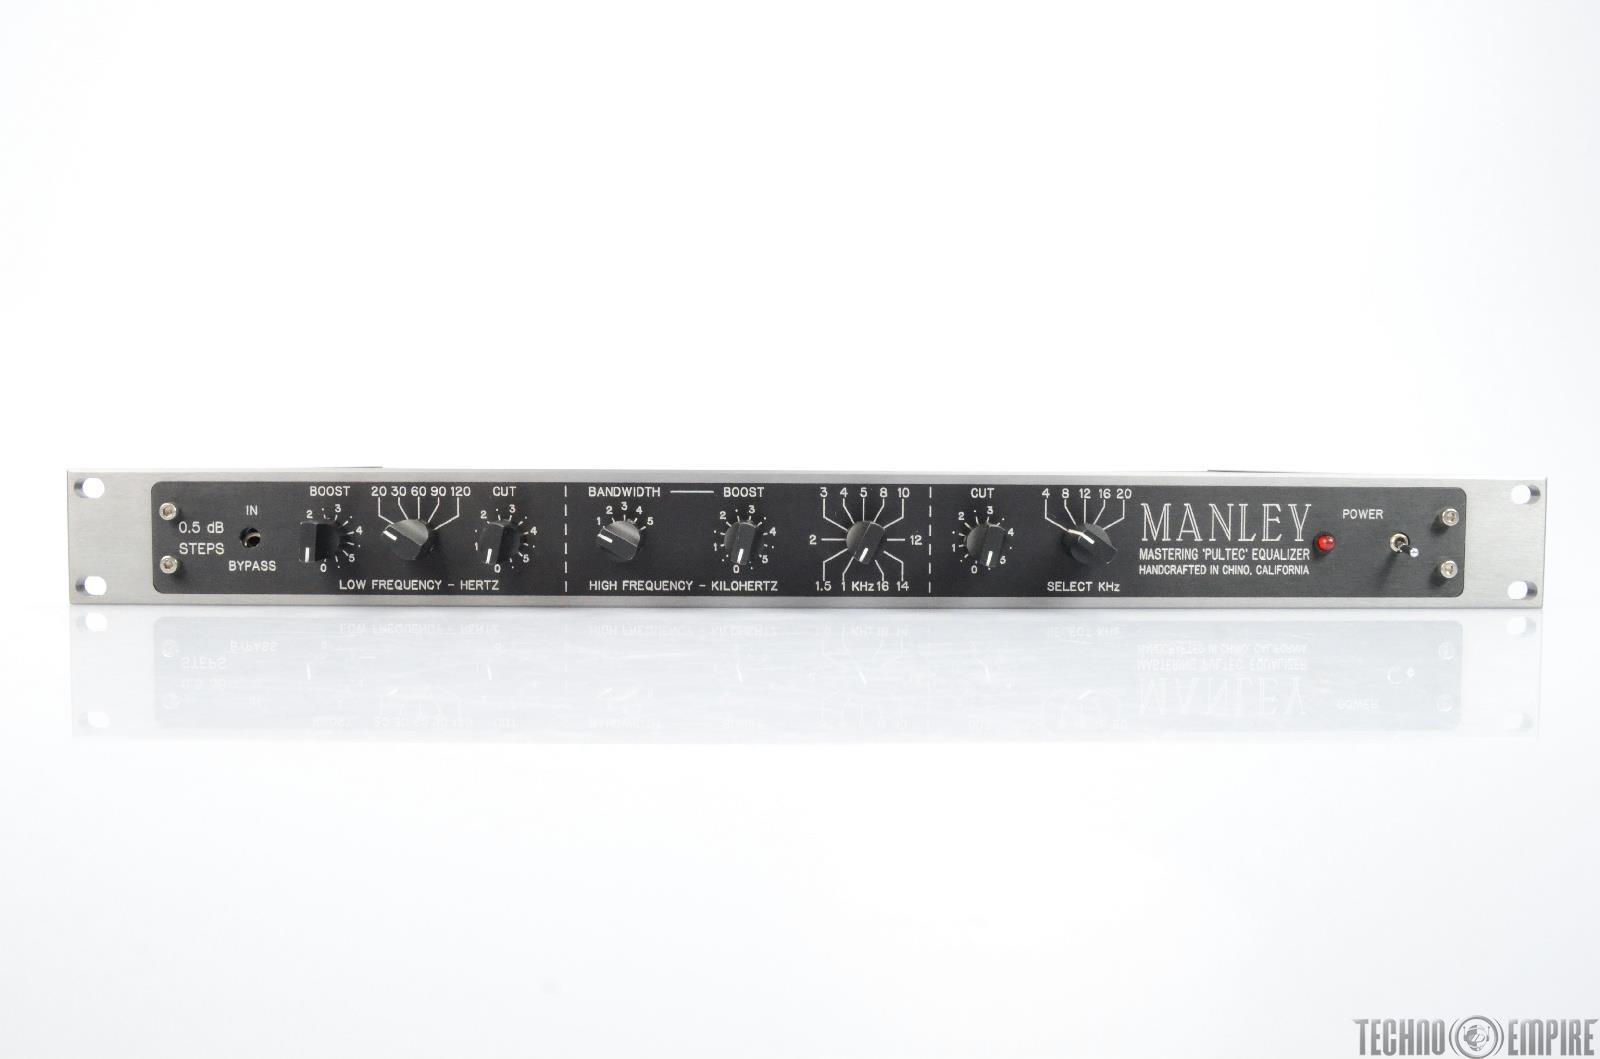 MANLEY Mastering Pultec Equalizer EQP-1A EQ #25705